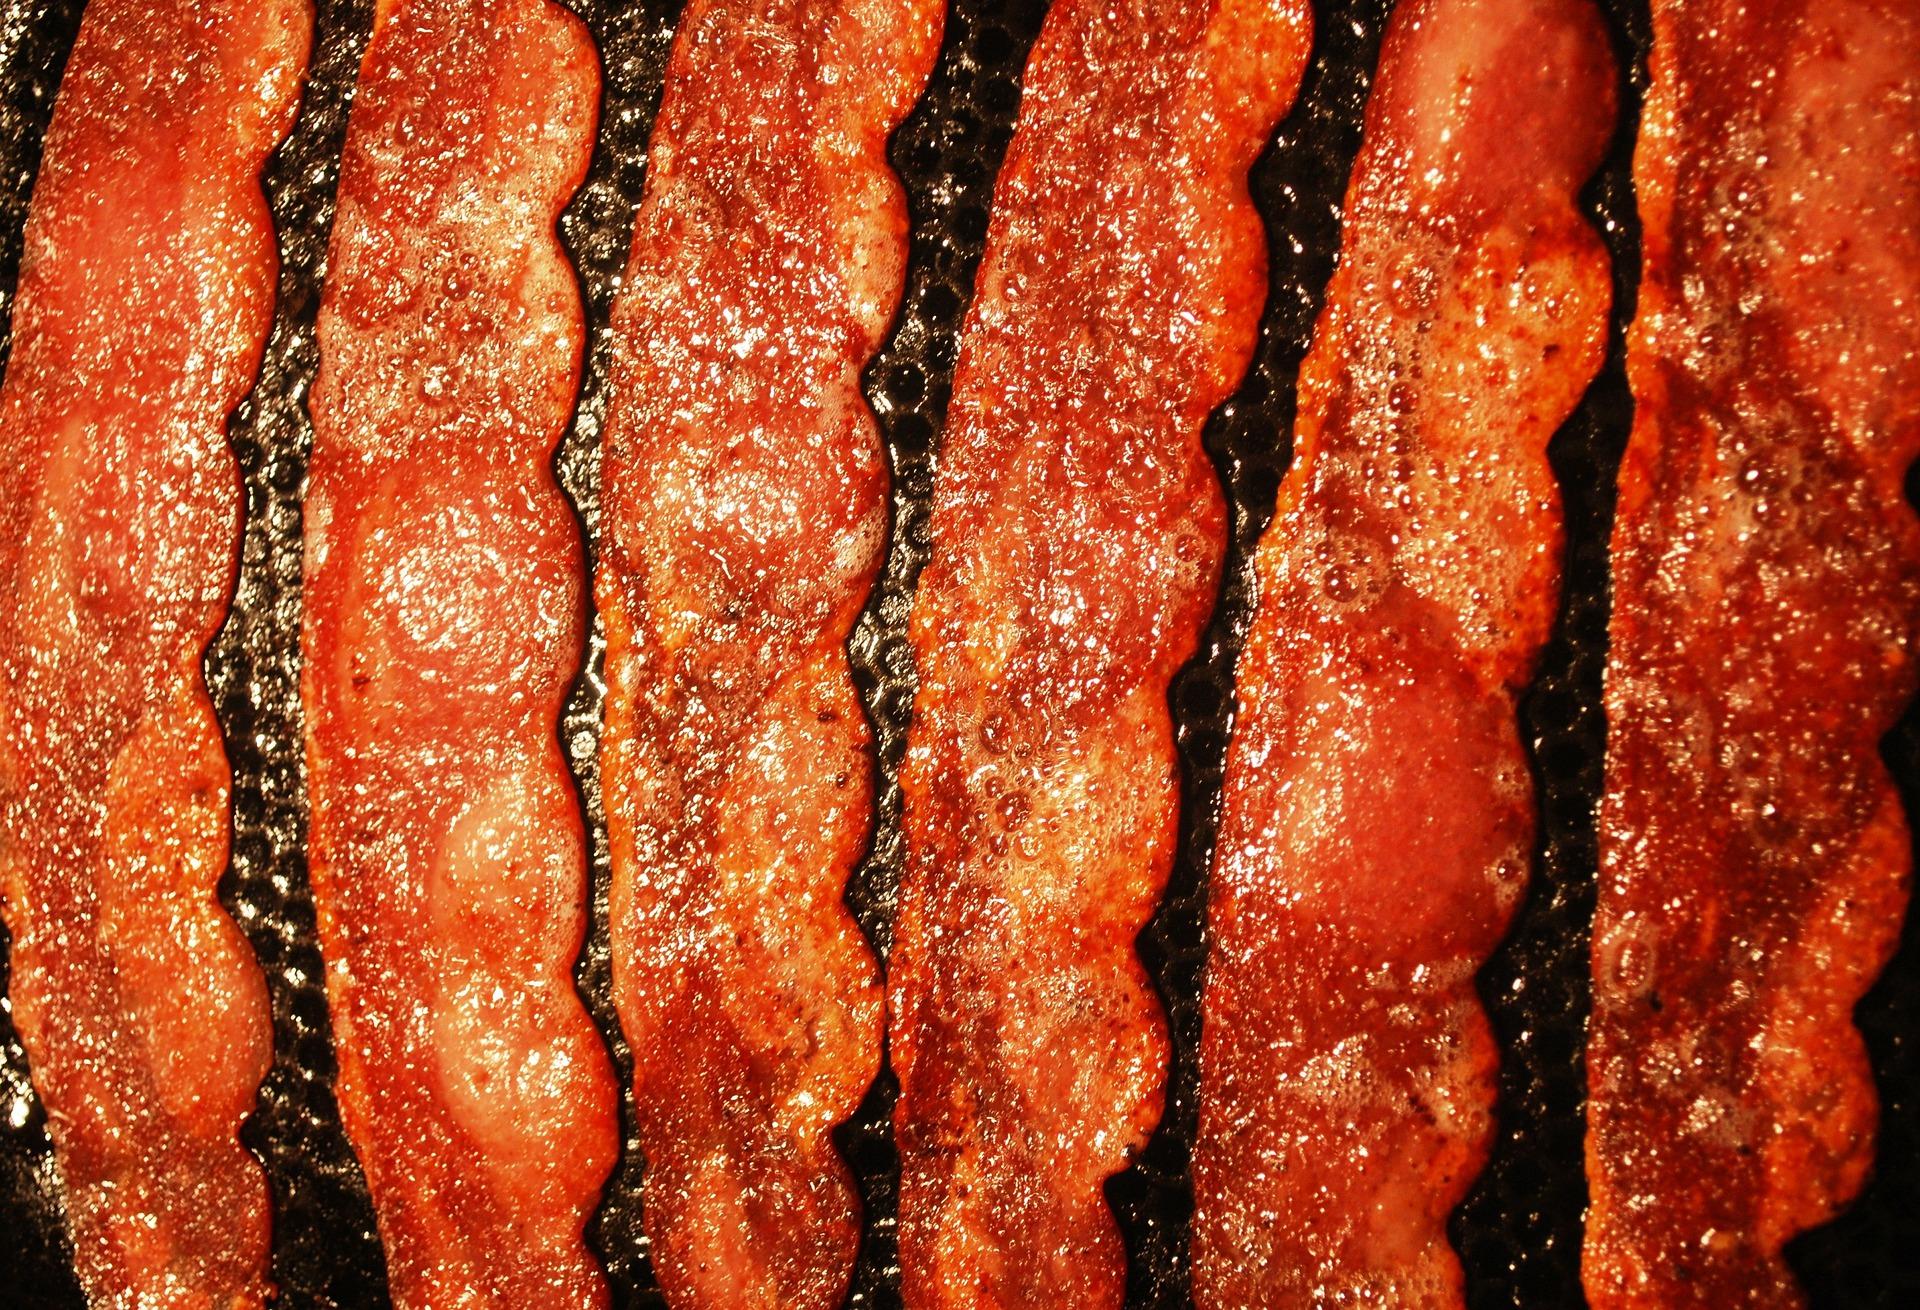 Bacon - Appliance City